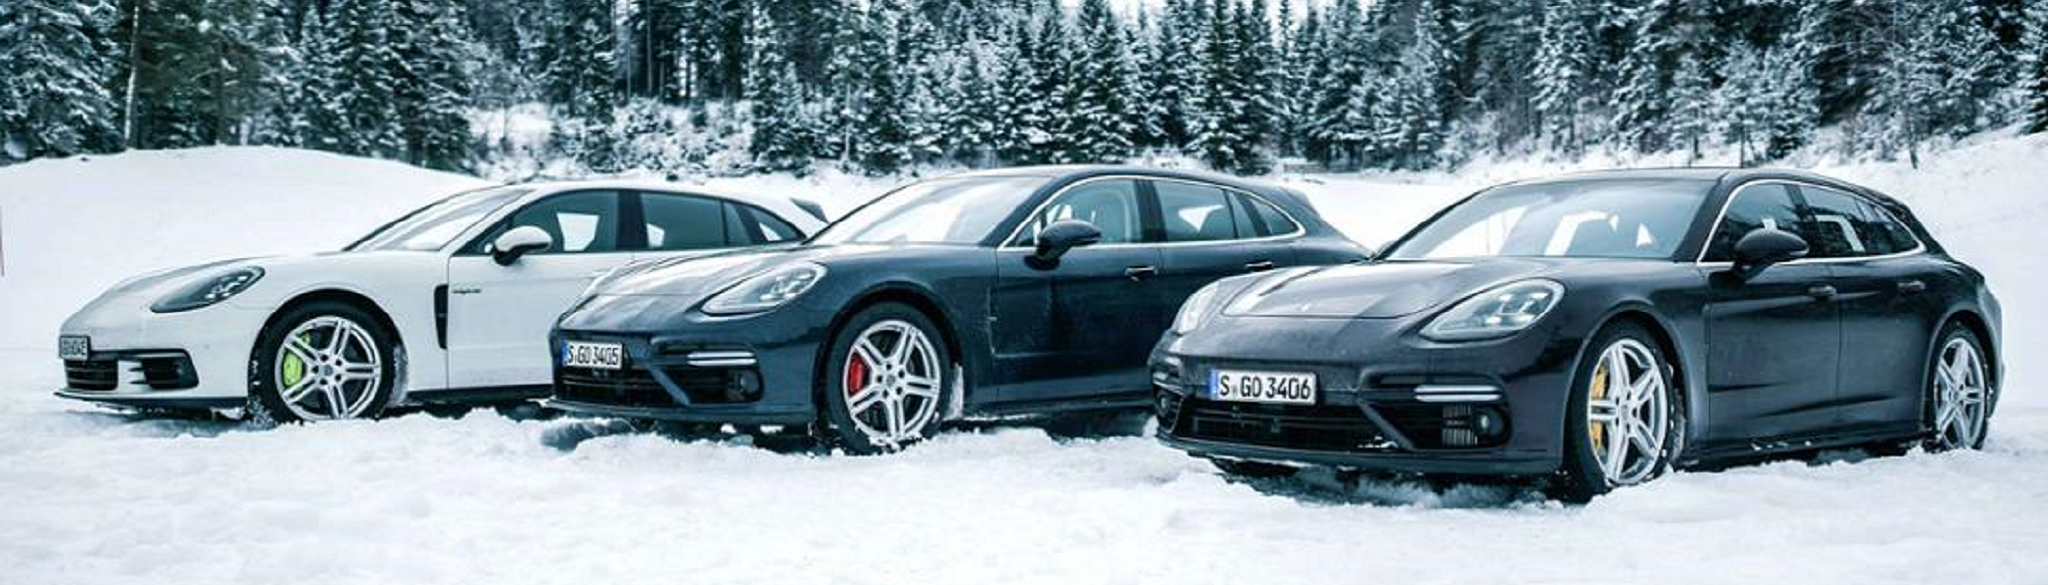 Preparing your Porsche for winter